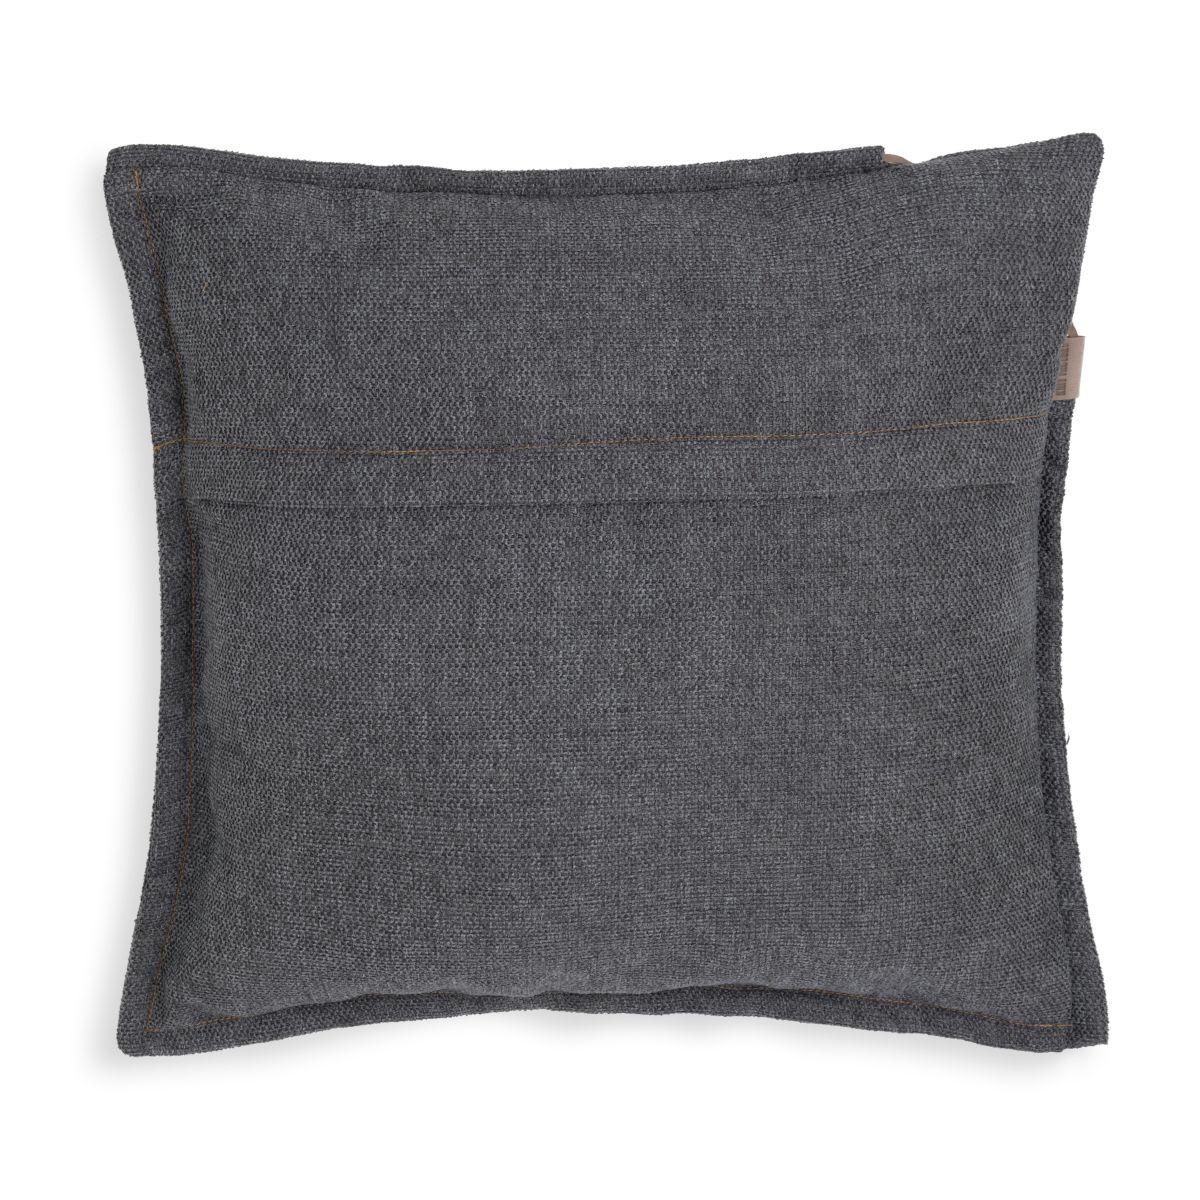 imre cushion anthracite 50x50